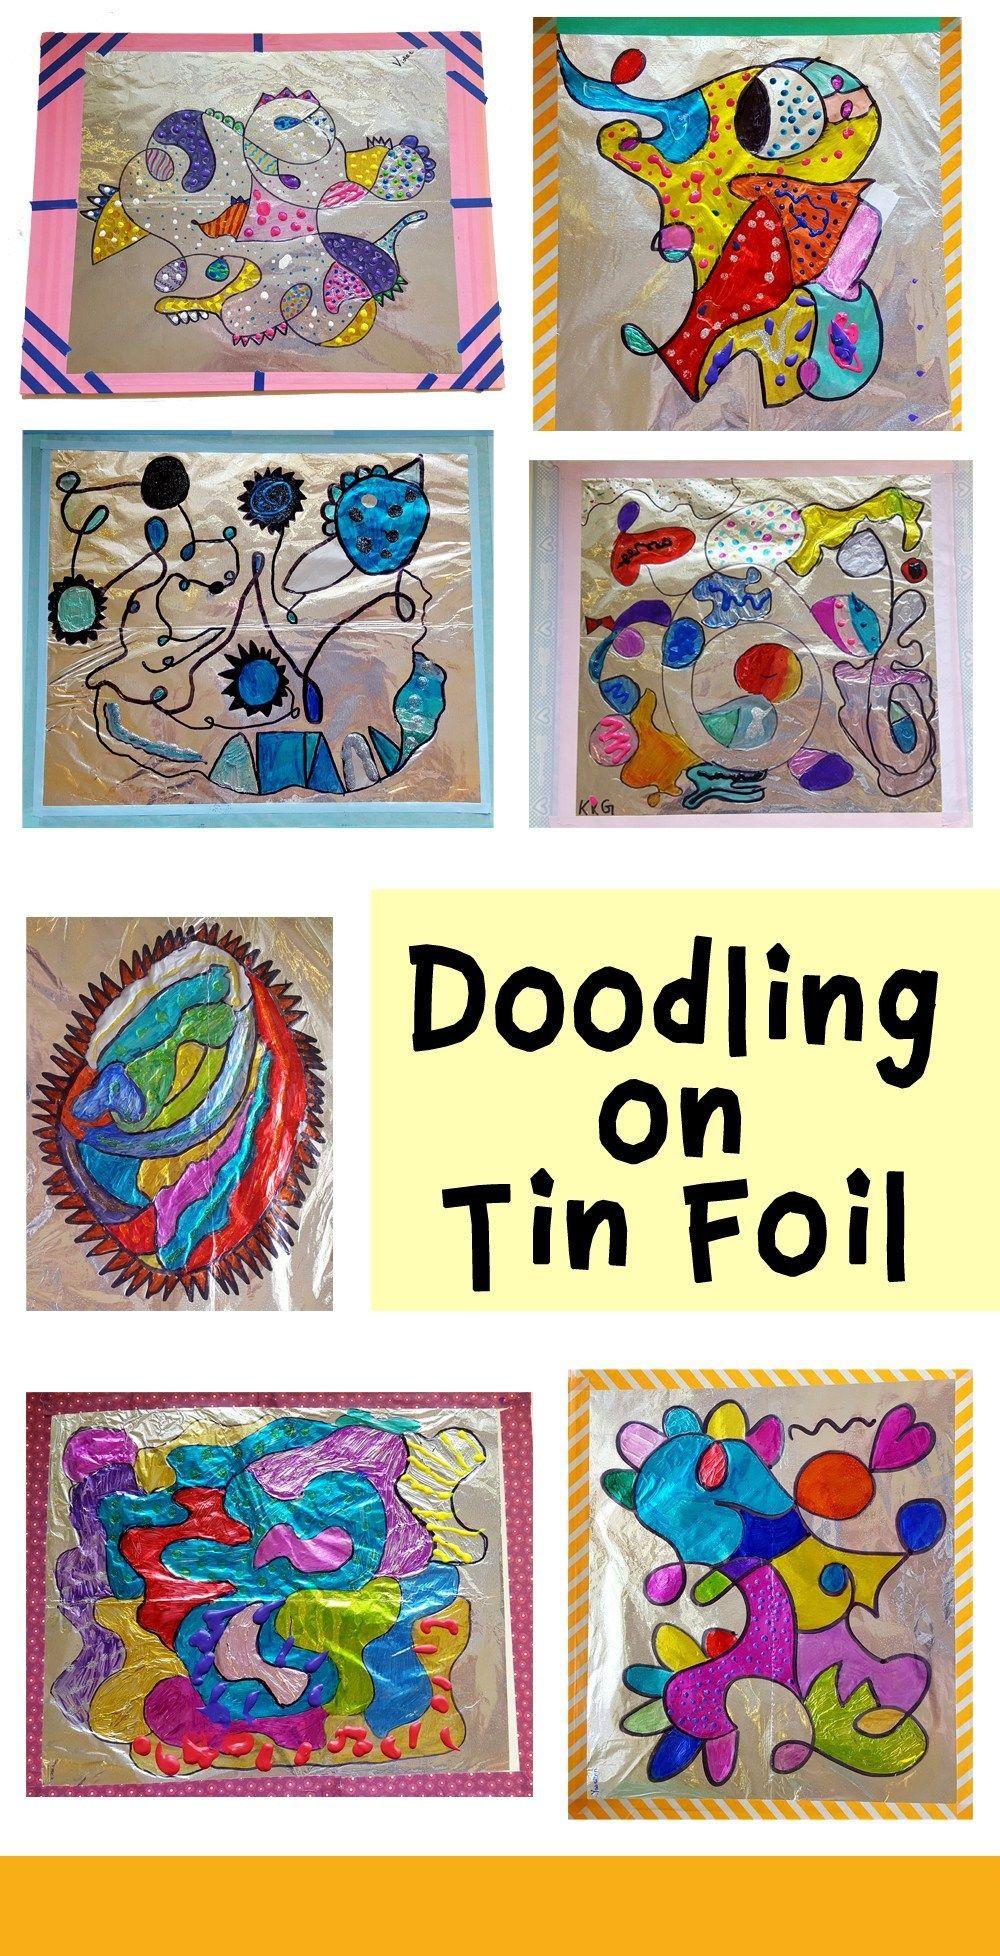 Sharpie Drawings On Tin Foil Elementary Art Projects Art Lessons Elementary Sharpie Drawings